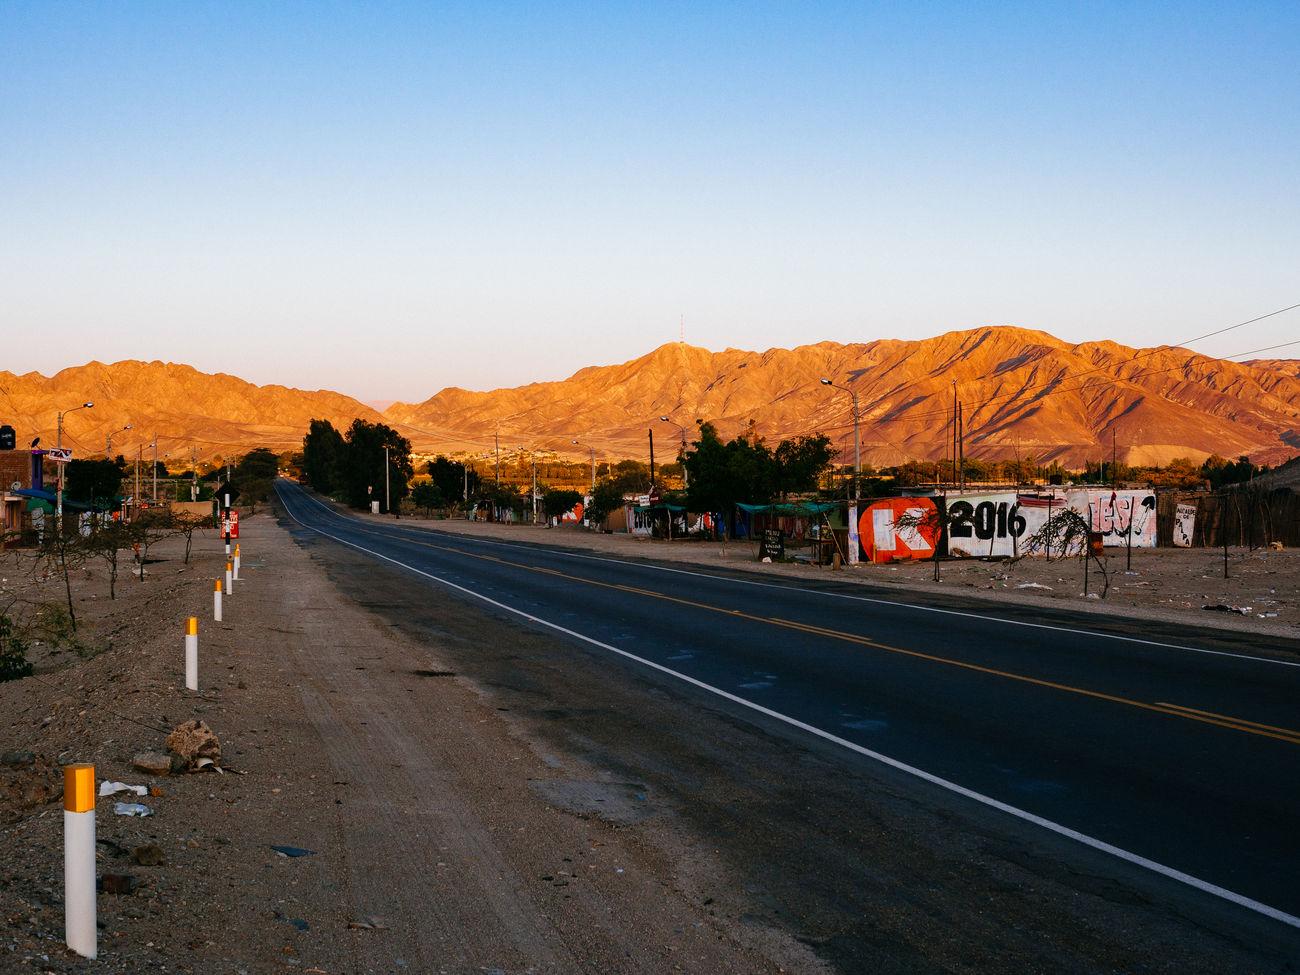 Panamericana Asphalt Clear Sky Mountain Mountain Range No People Panamericana Peru Road Scenics Transportation